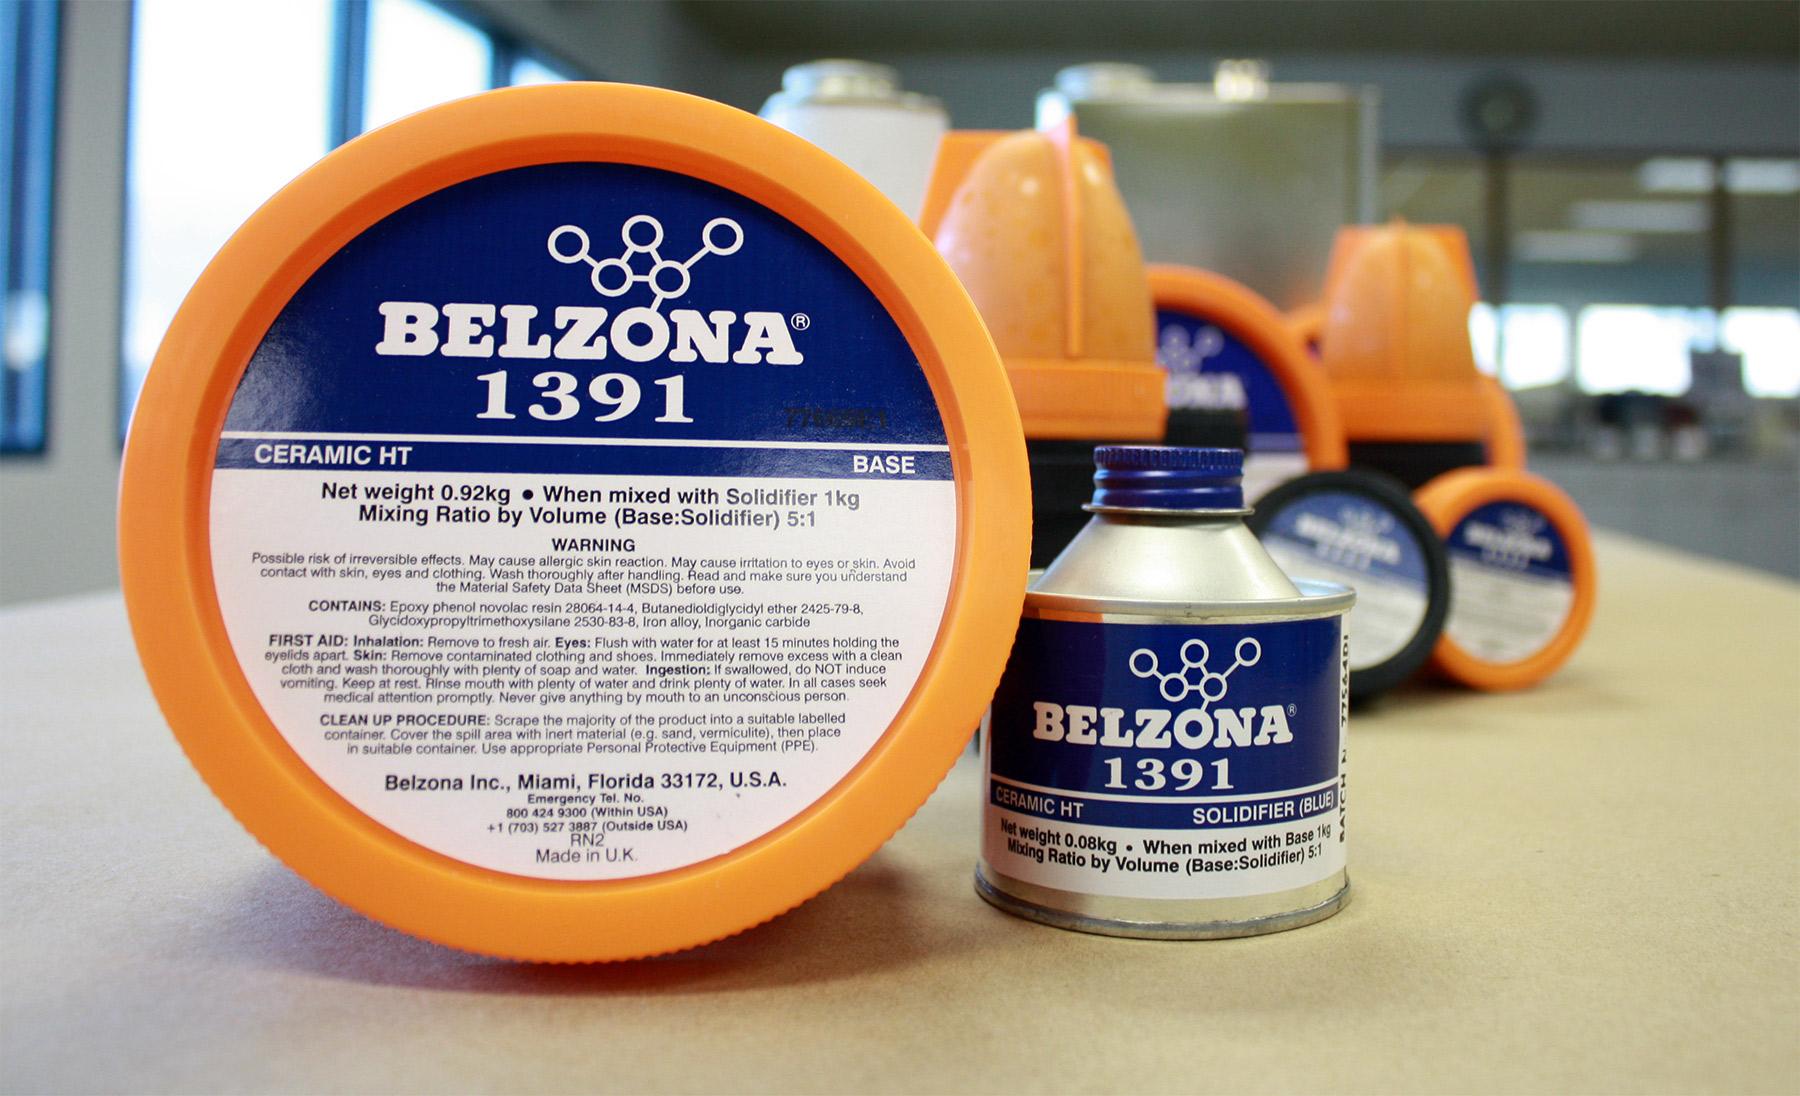 Belzona 1391